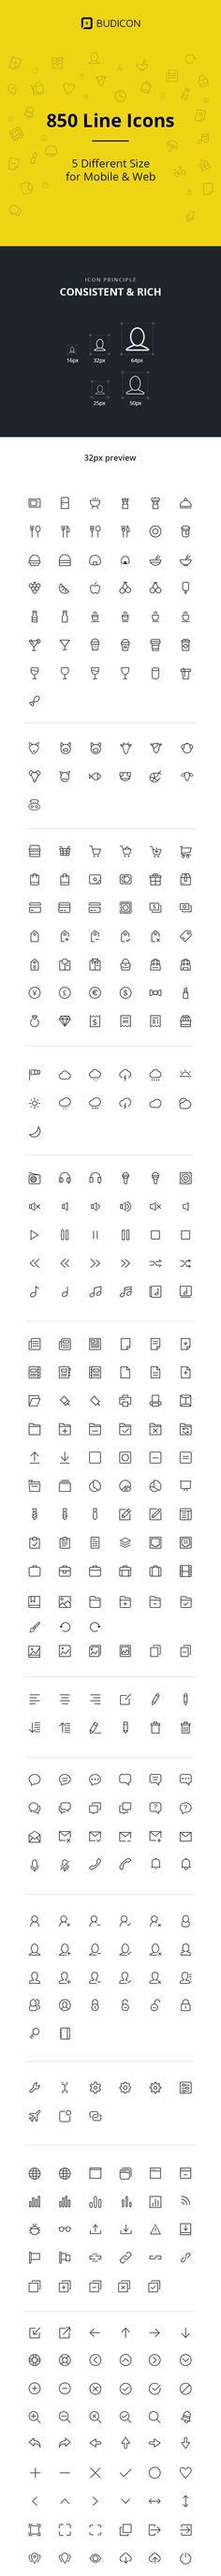 Budicon - 850 Scalable Vector Line Icons by Budi Harto Tanrim, via Behance #Minimalist #Illustration #icon